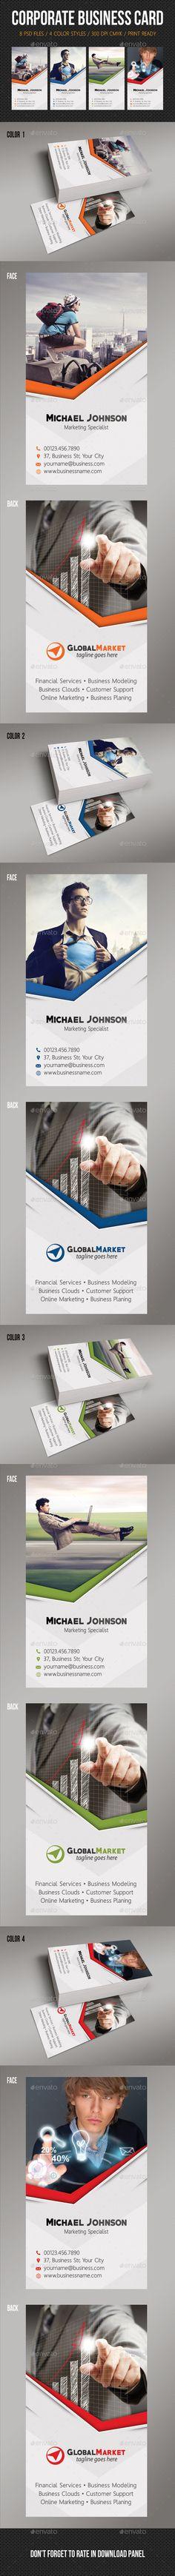 Corporate Business Card Design Tempalte Download: http://graphicriver.net/item/corporate-business-card-13/12943621?ref=ksioks